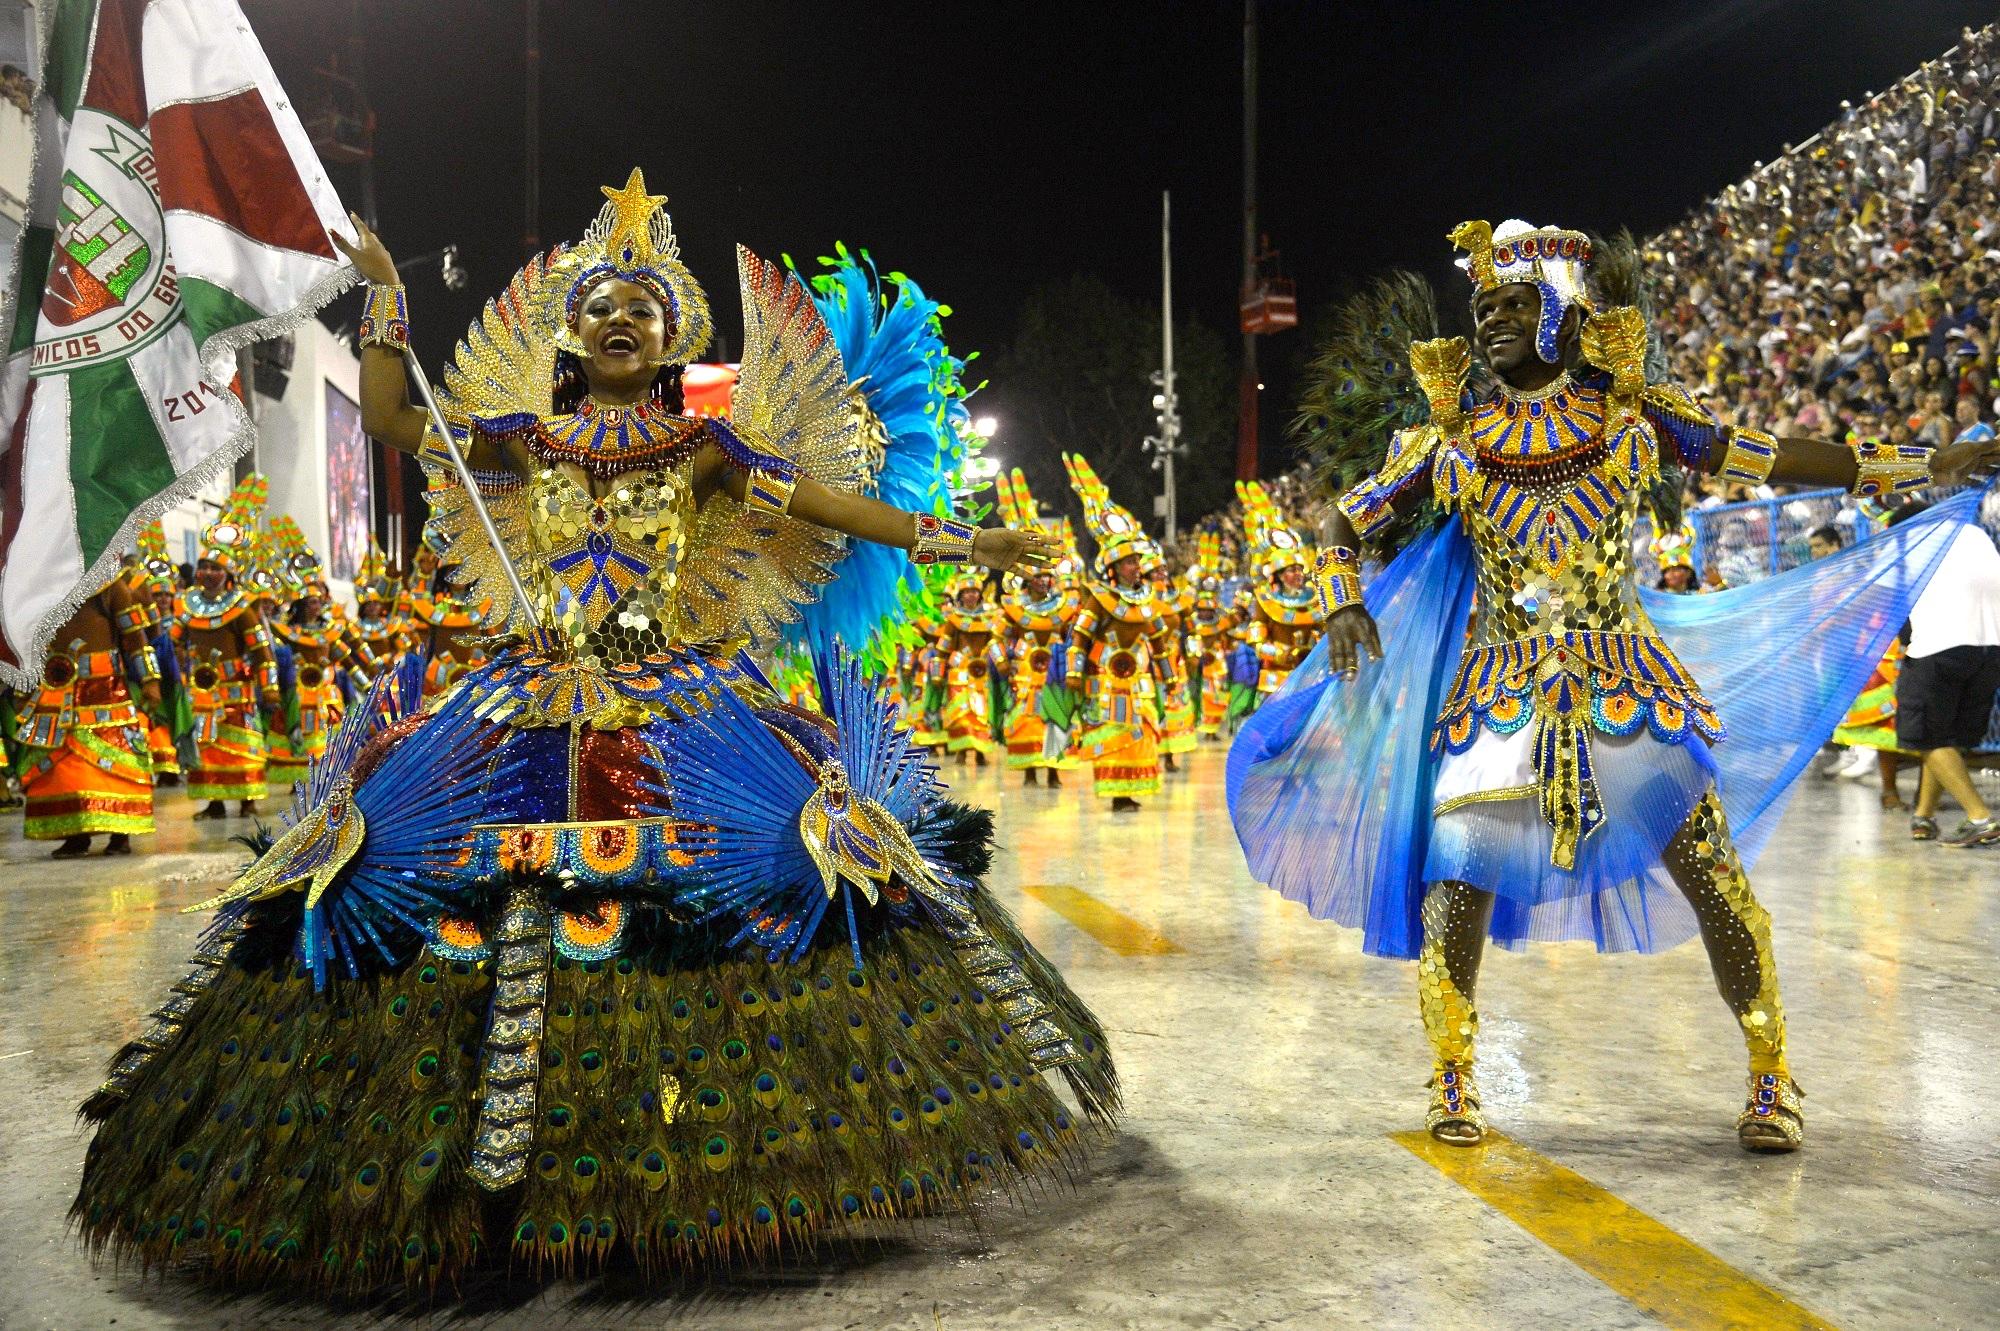 участники парада - карнавала в Рио